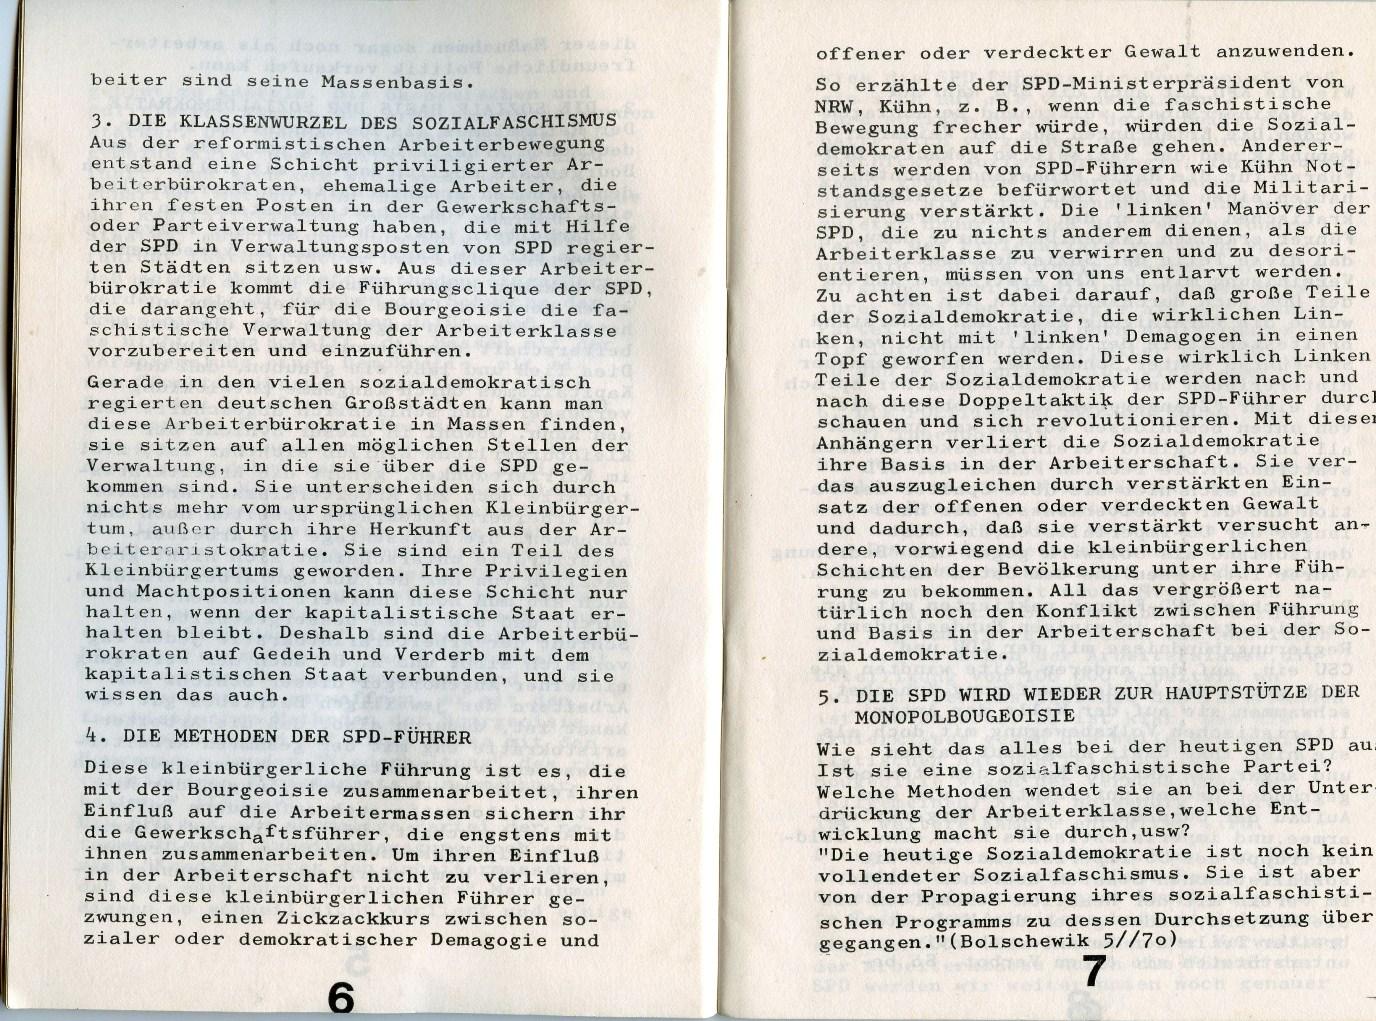 KJVD_Sozialdemokratie_Sozialfaschismus_1971_05